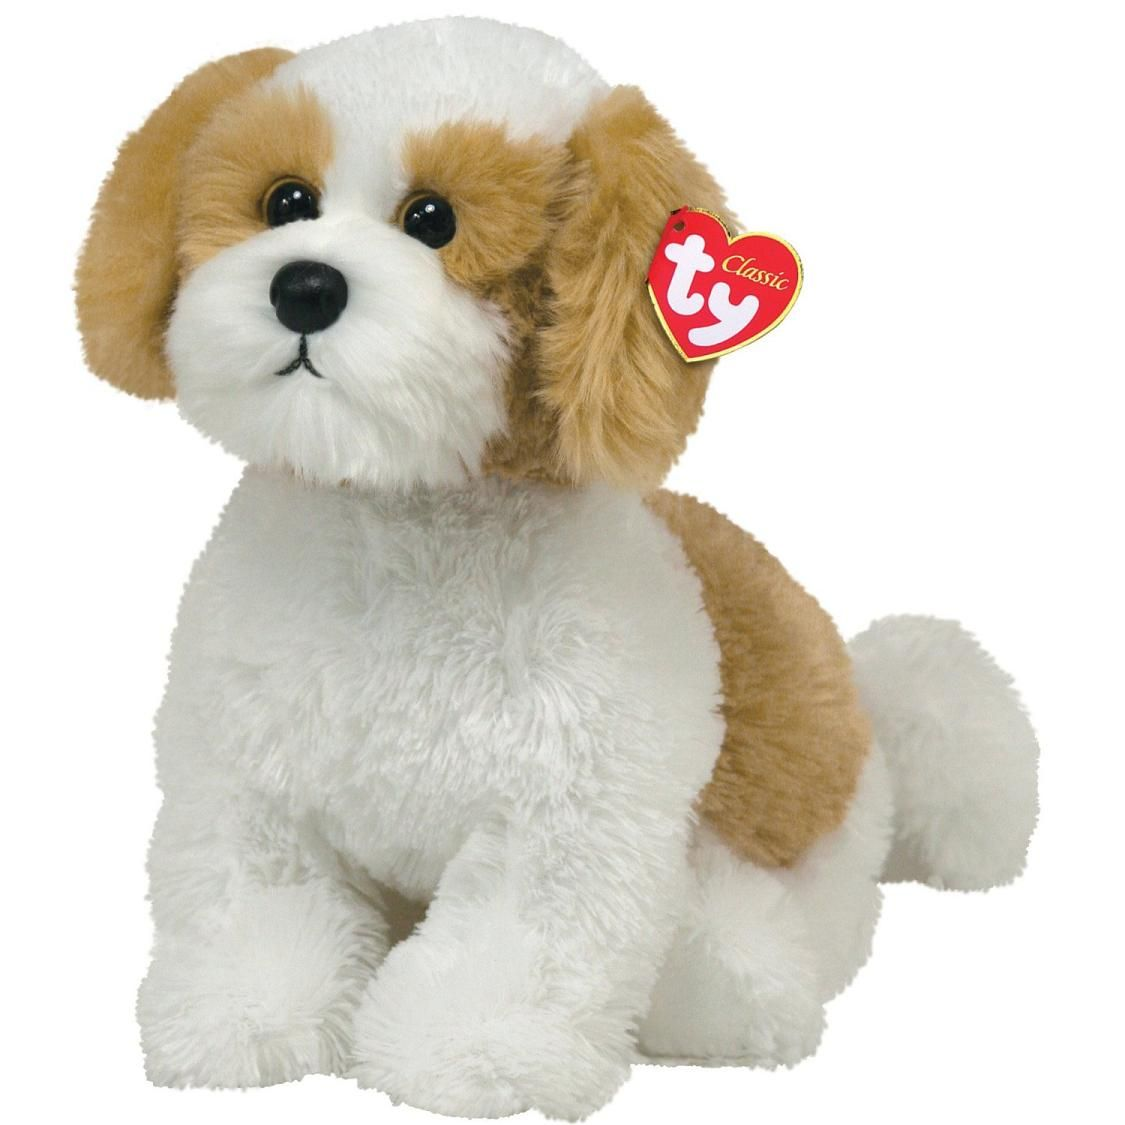 Barley Brown White Dog Dog Puppy Stuffed Animal By Ty 20065